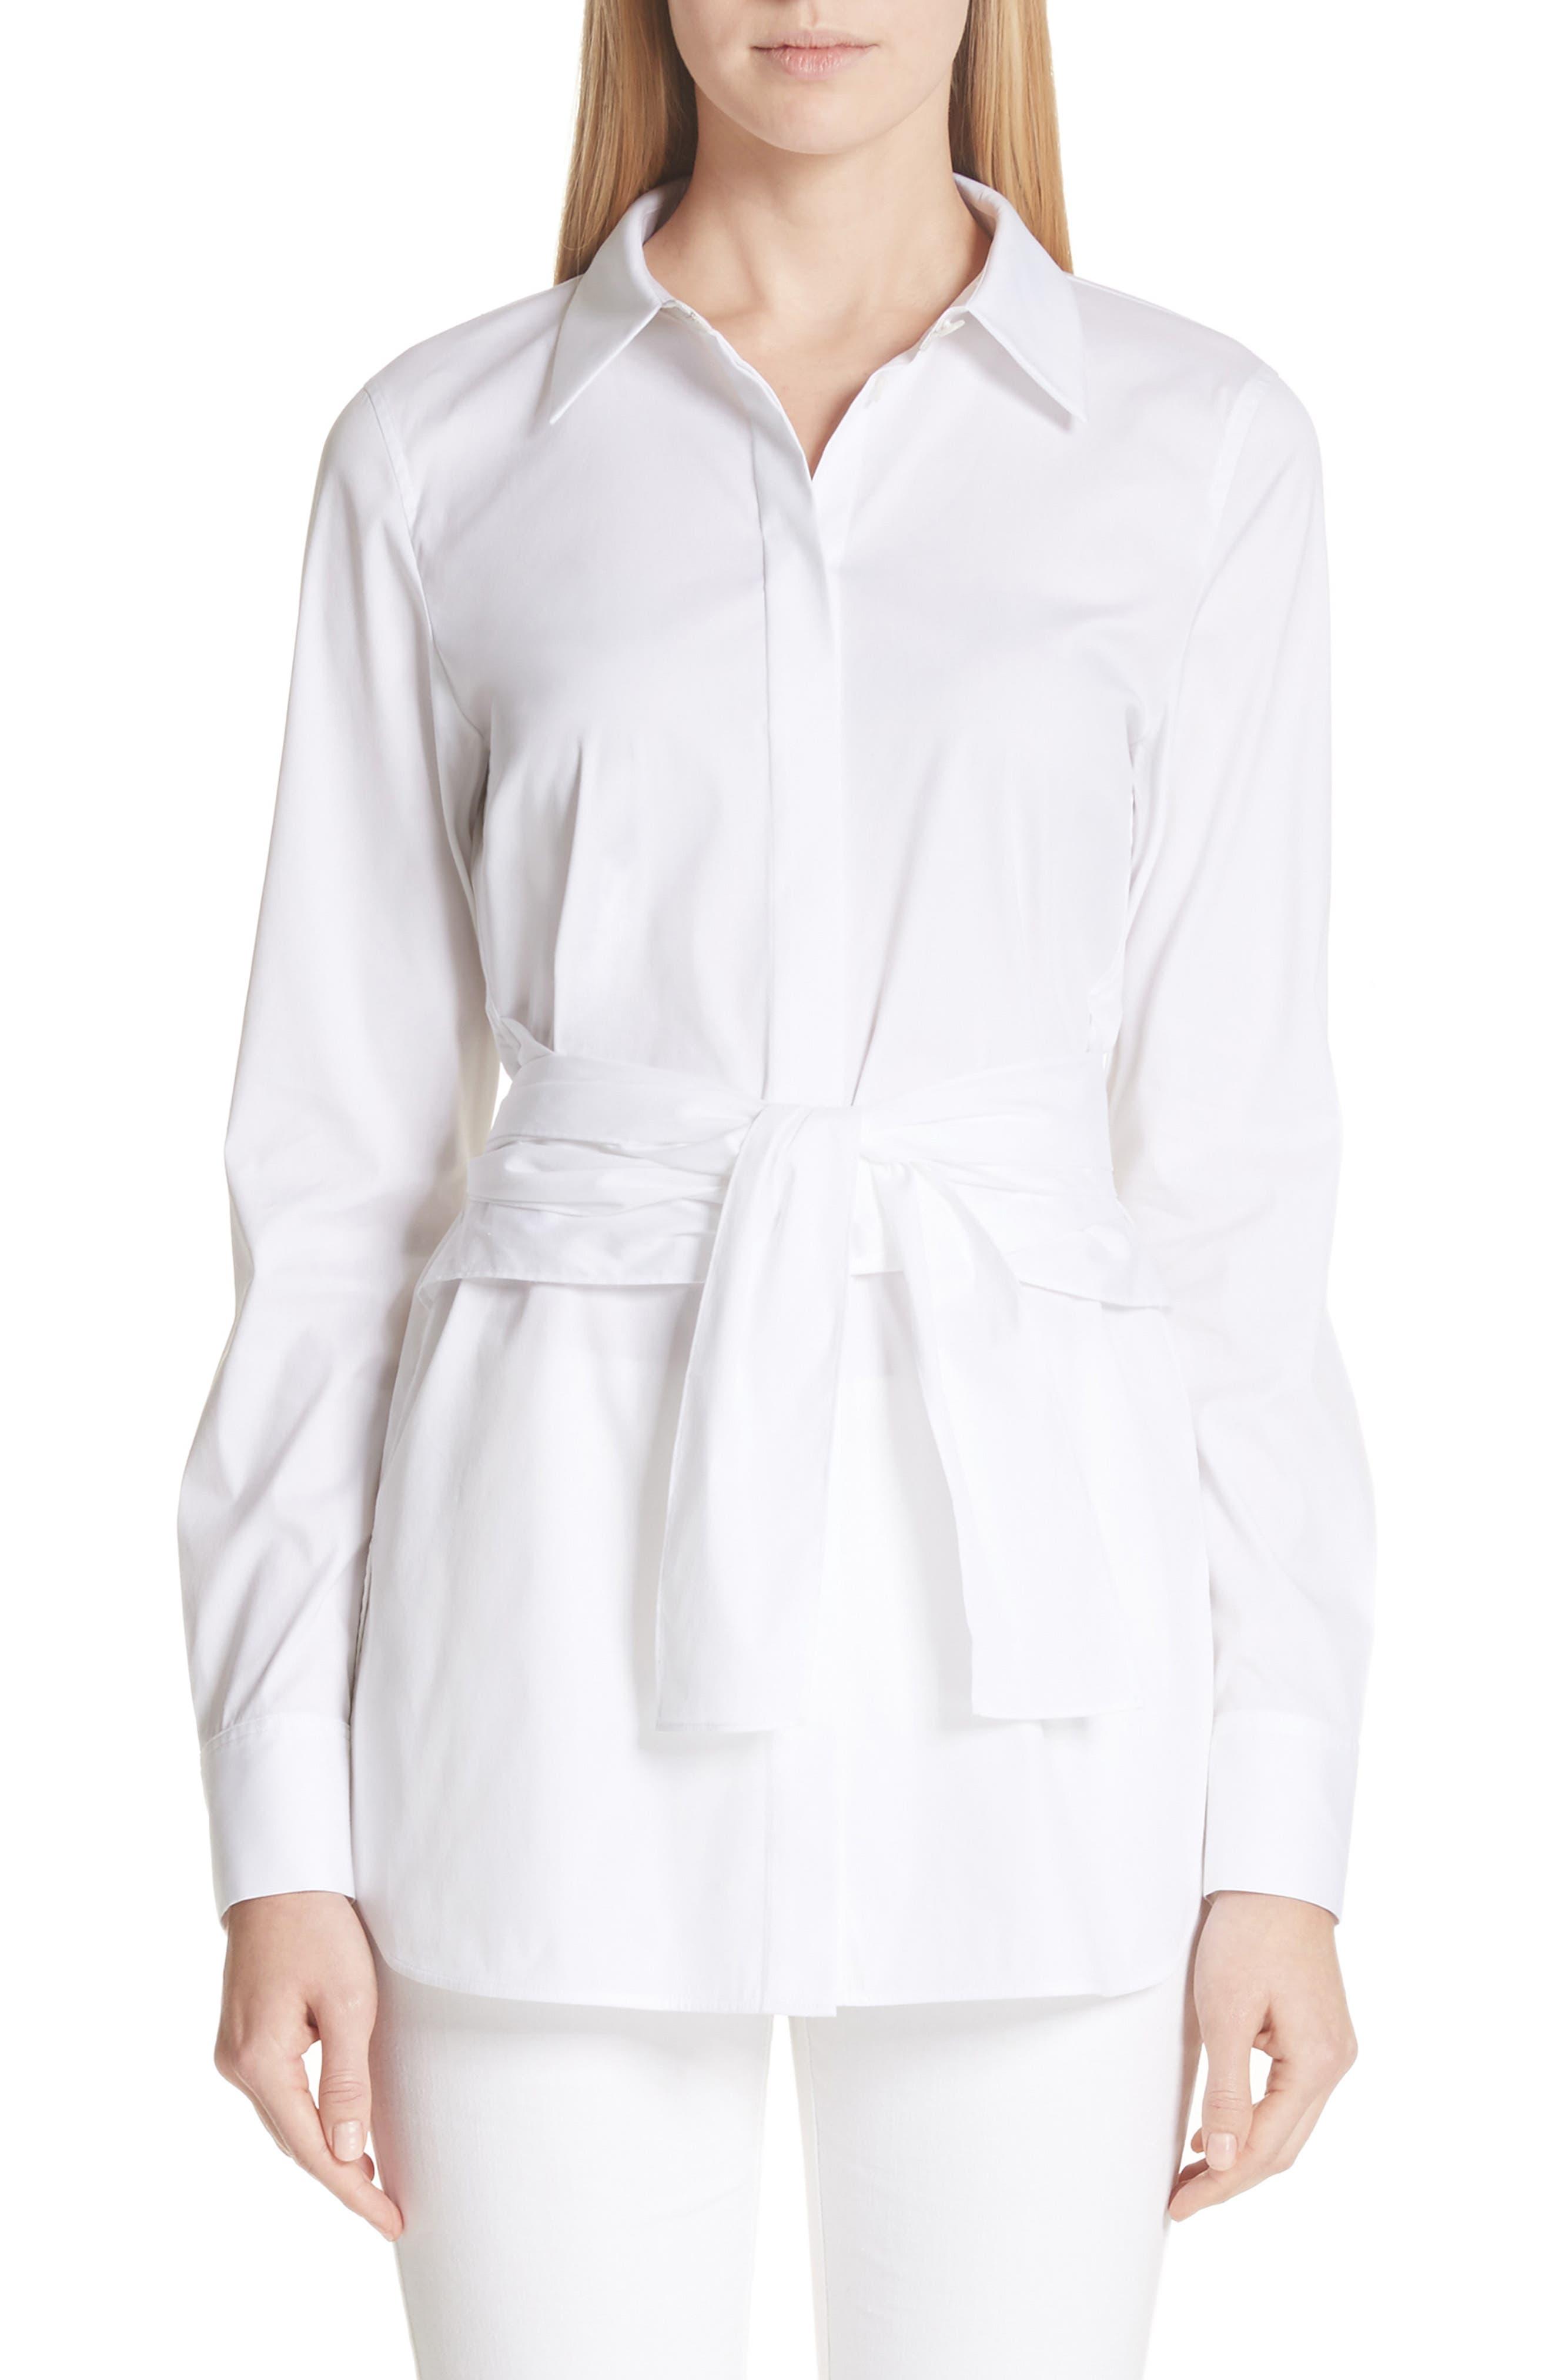 Cordelia Stretch Blouse,                         Main,                         color, White